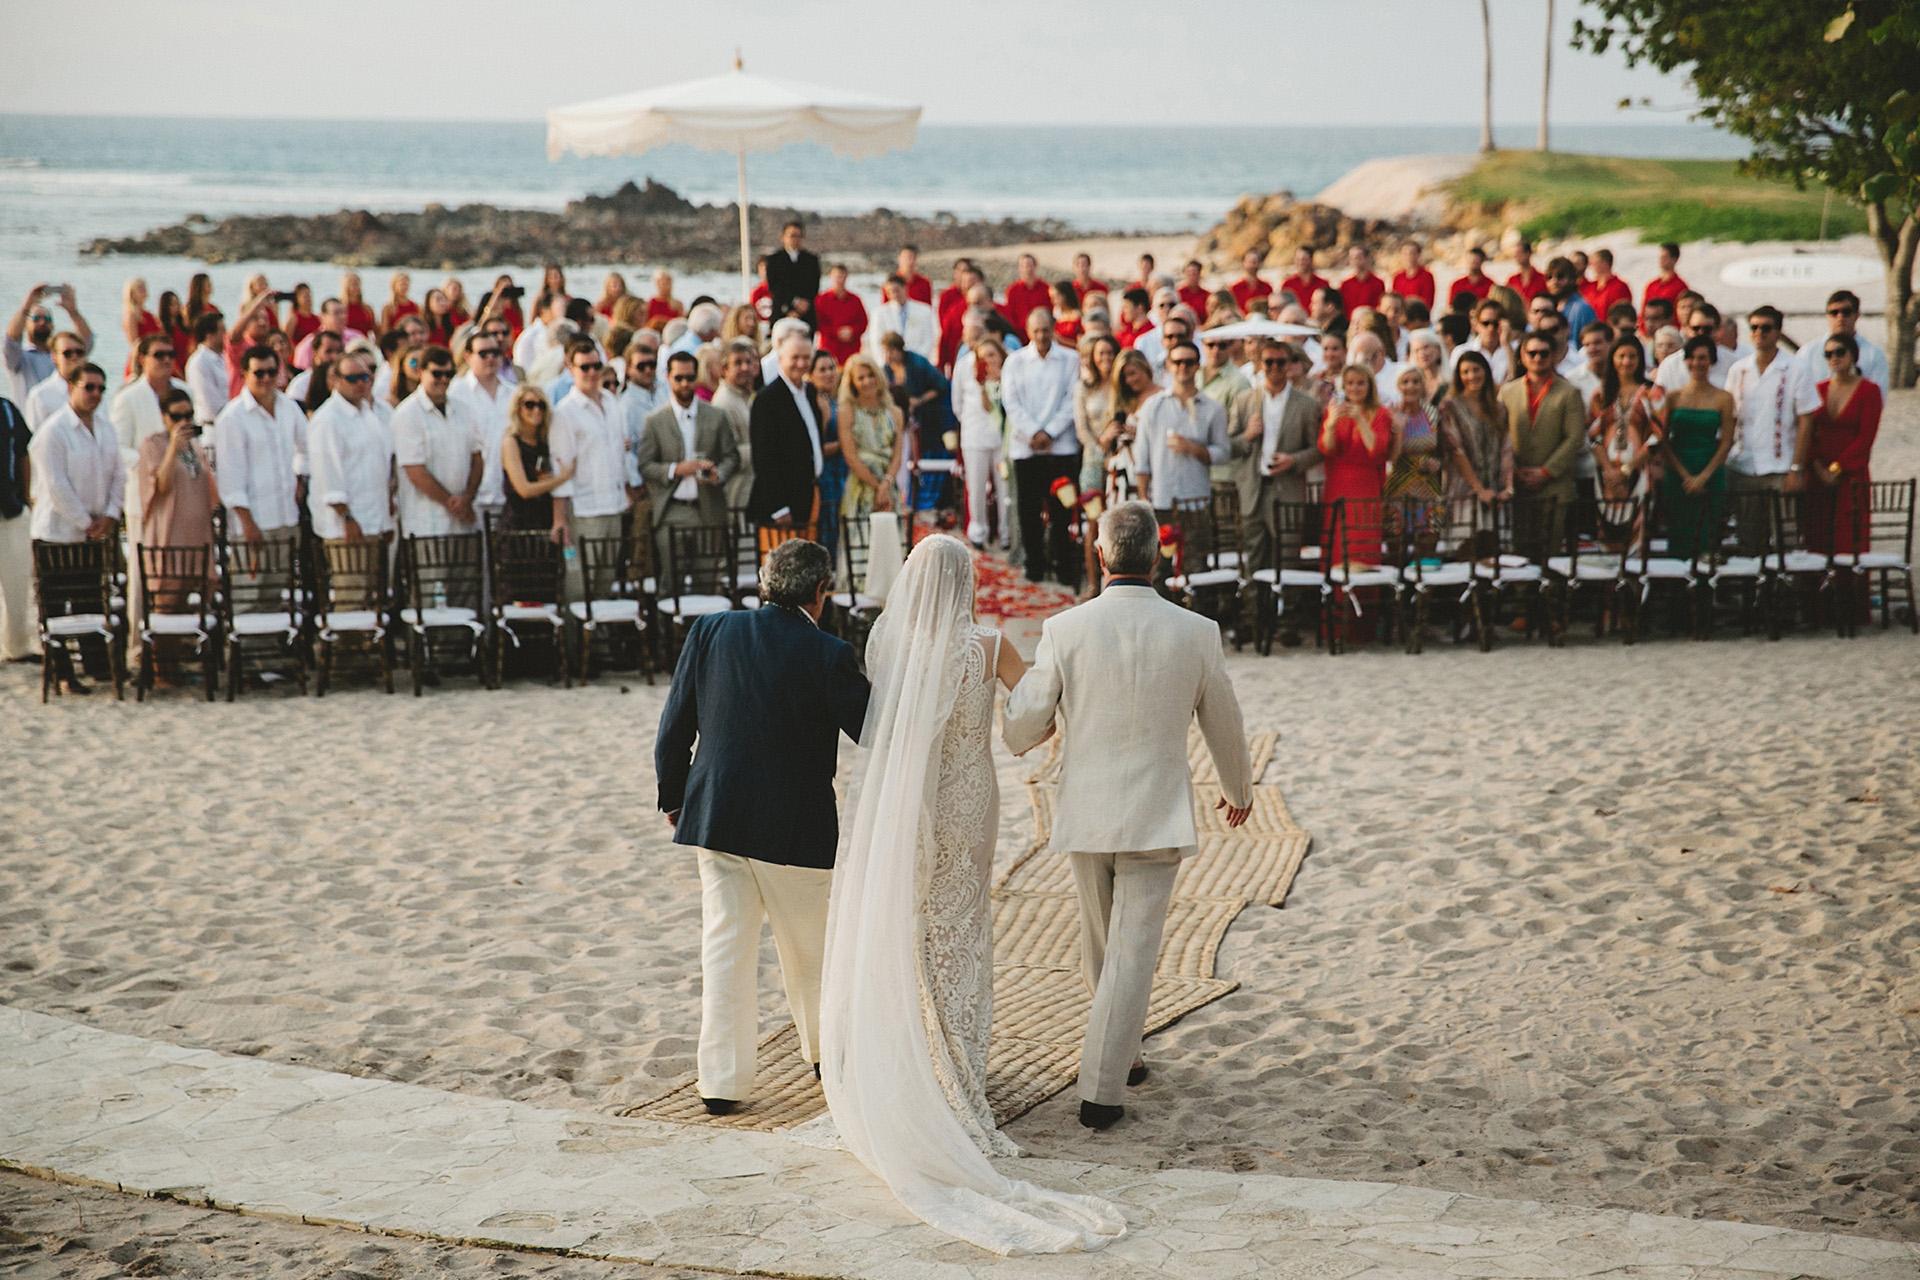 bride walking down isle at beach wedding